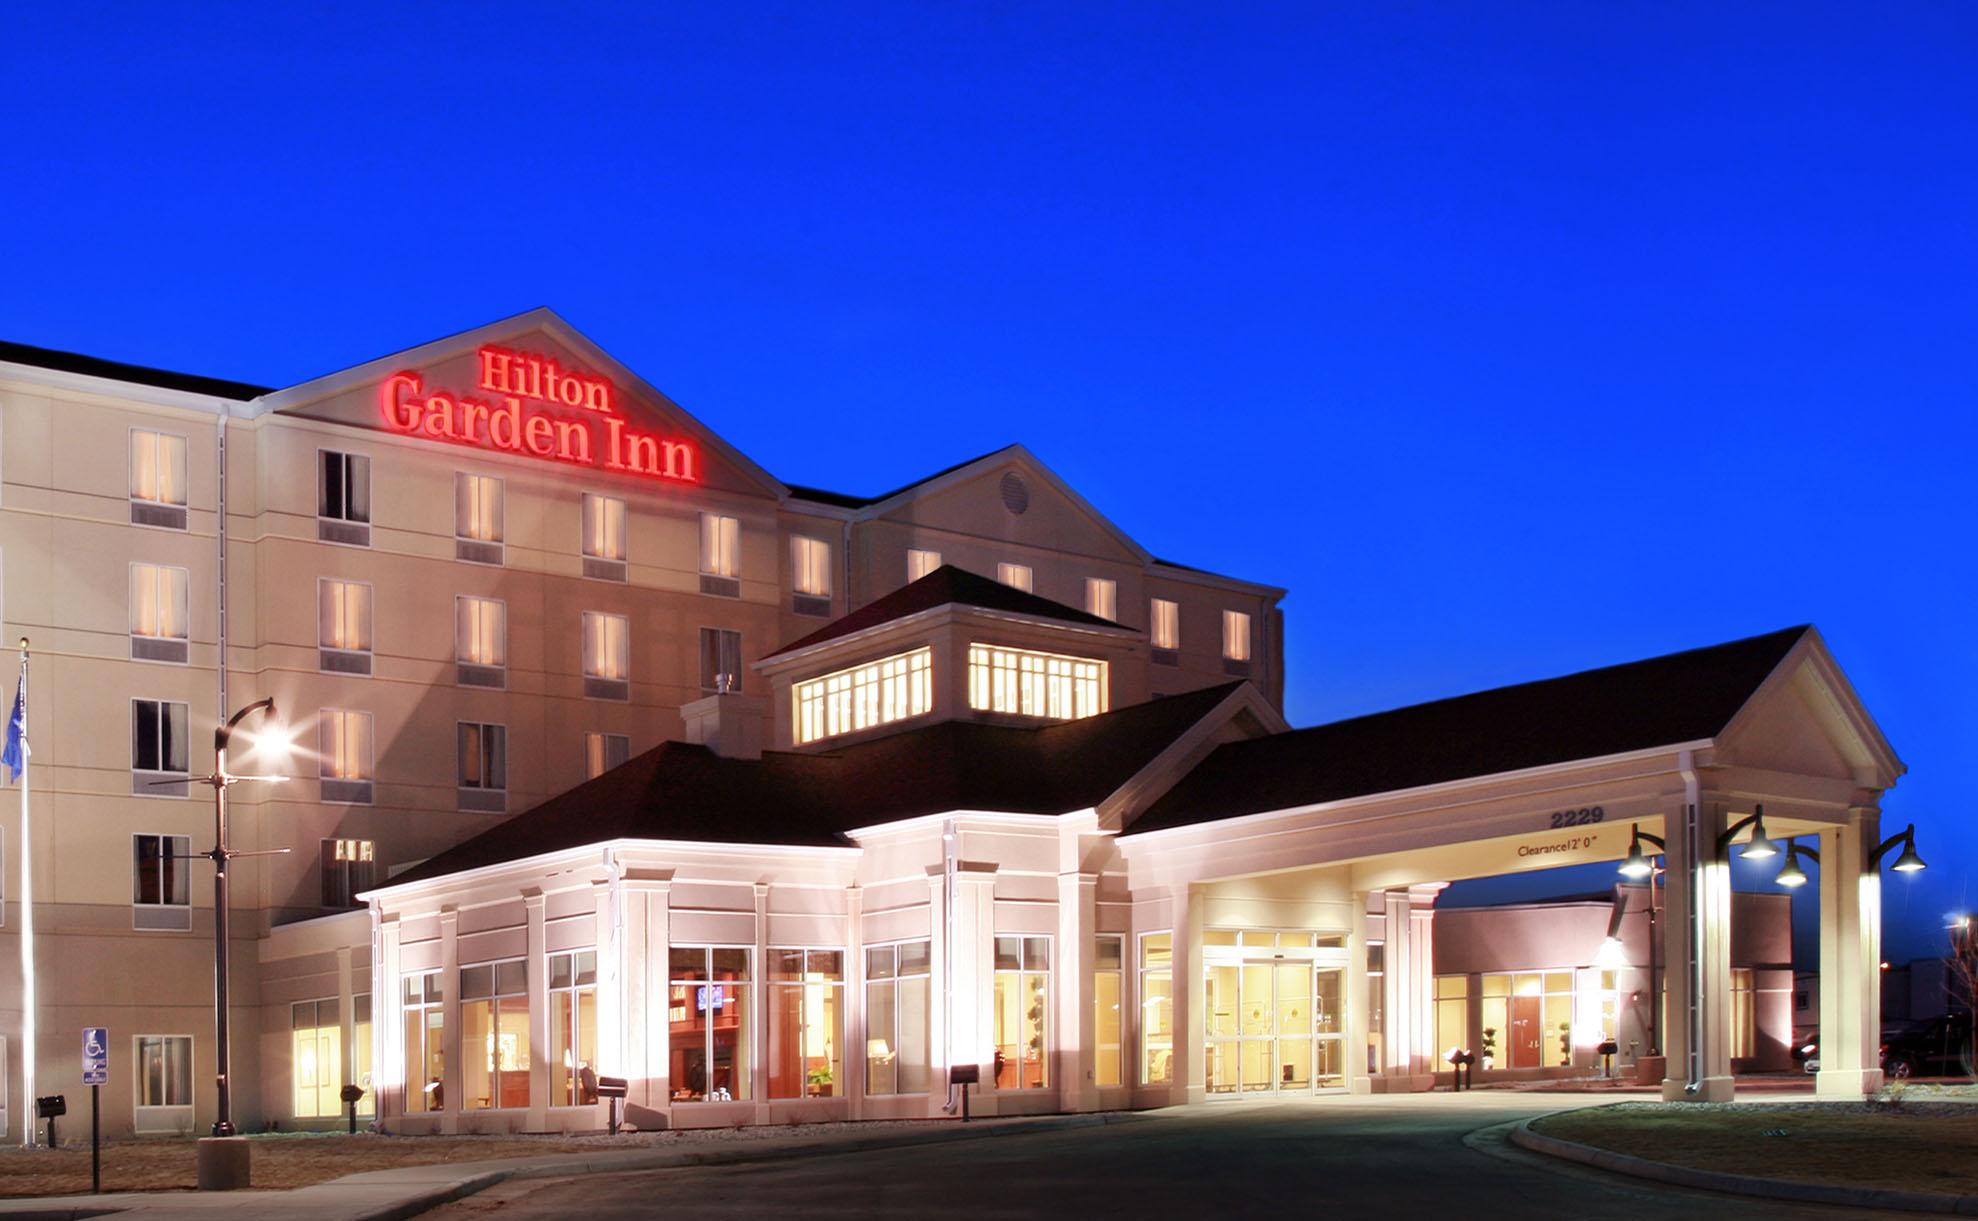 Hilton Garden Inn Laramie Wyoming